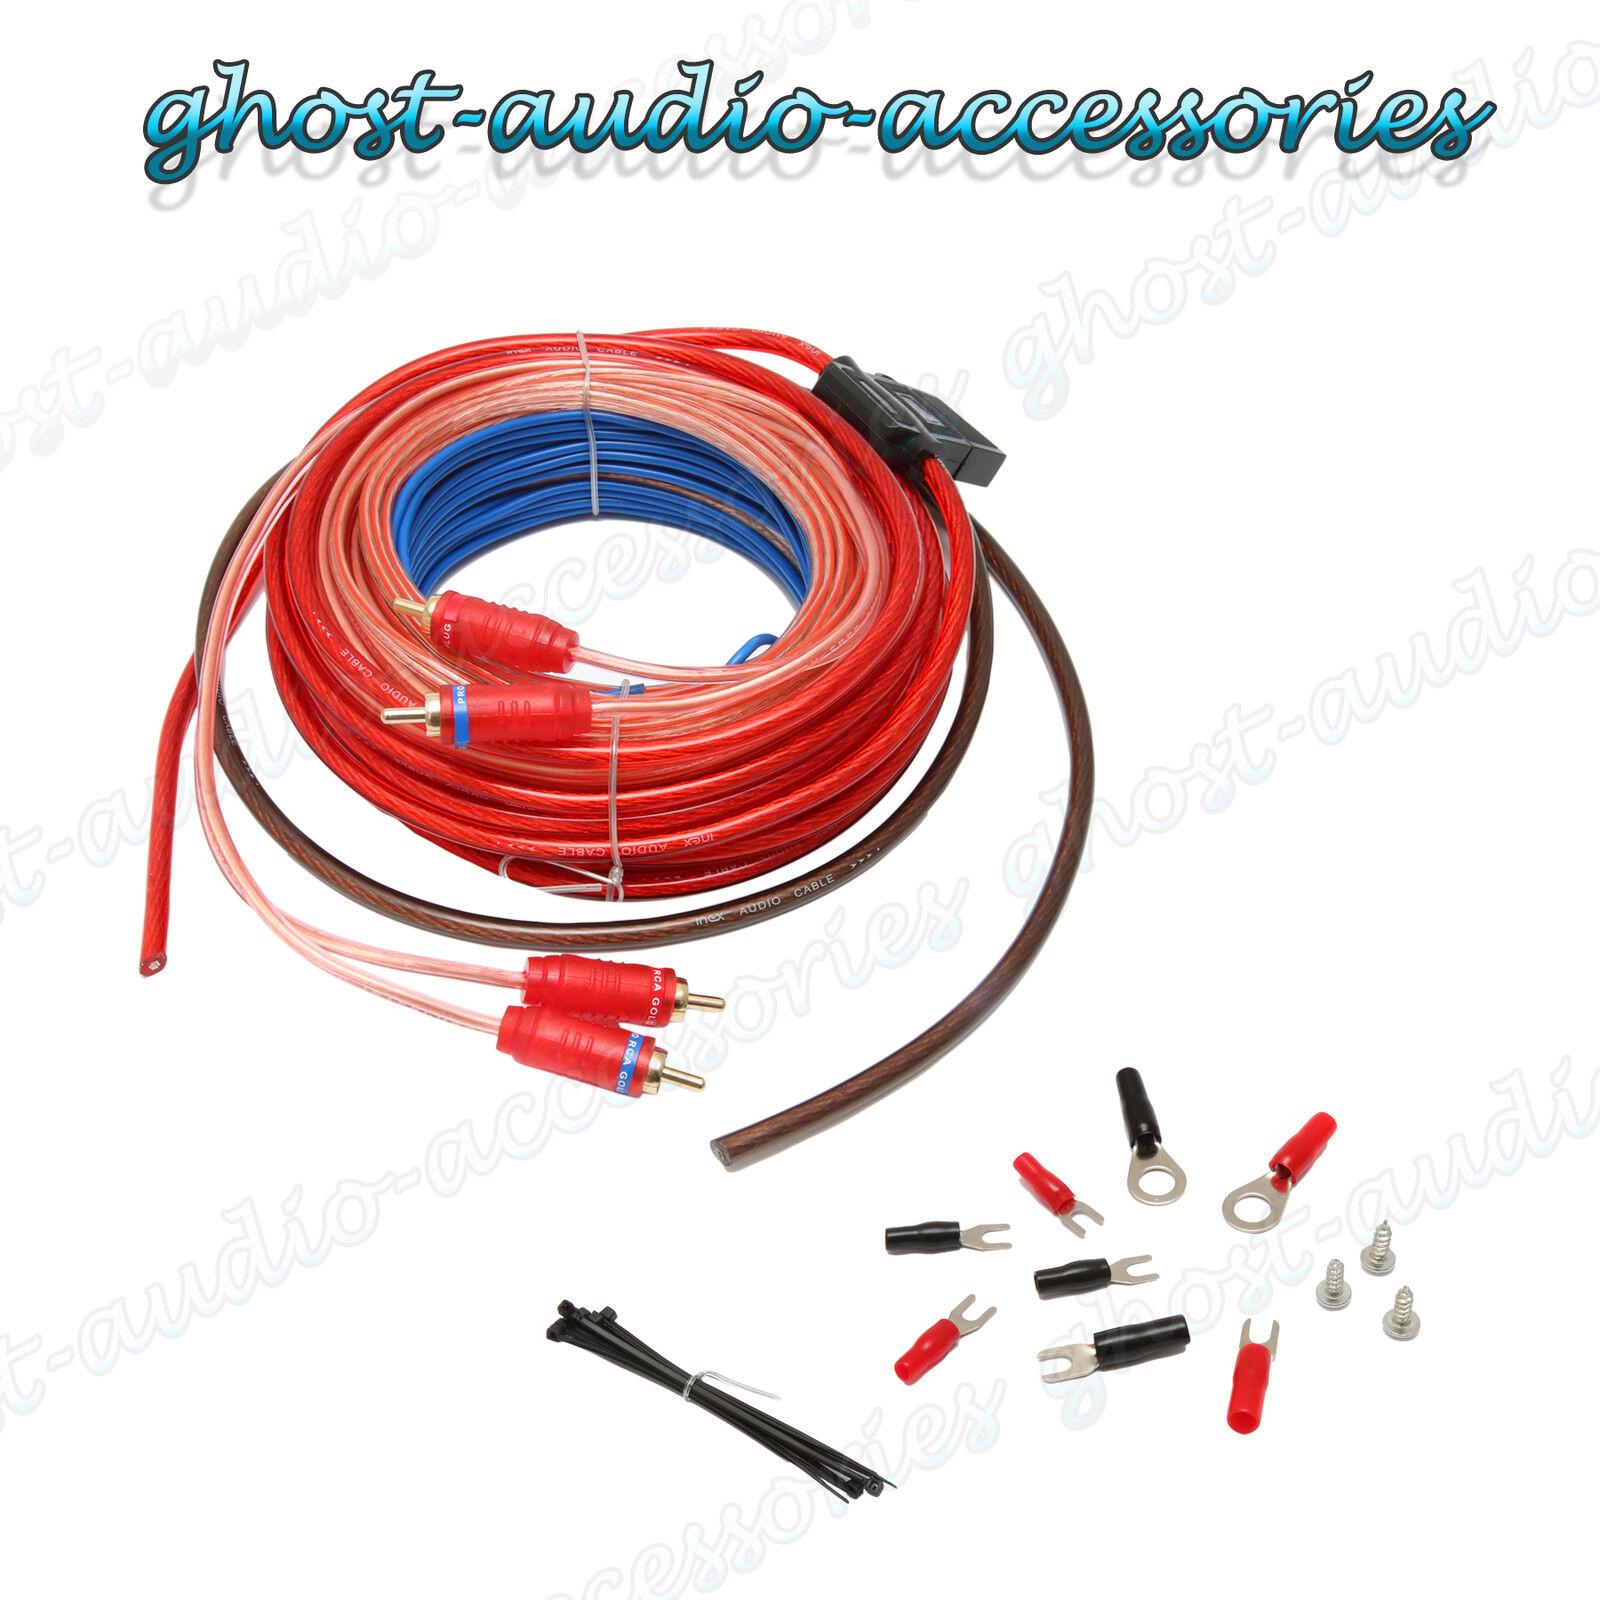 10 gauge Car Amplifier Amp Wiring Kit 250 - 1000w watts  sc 1 st  eBay : 10 gauge amp wiring kit - yogabreezes.com